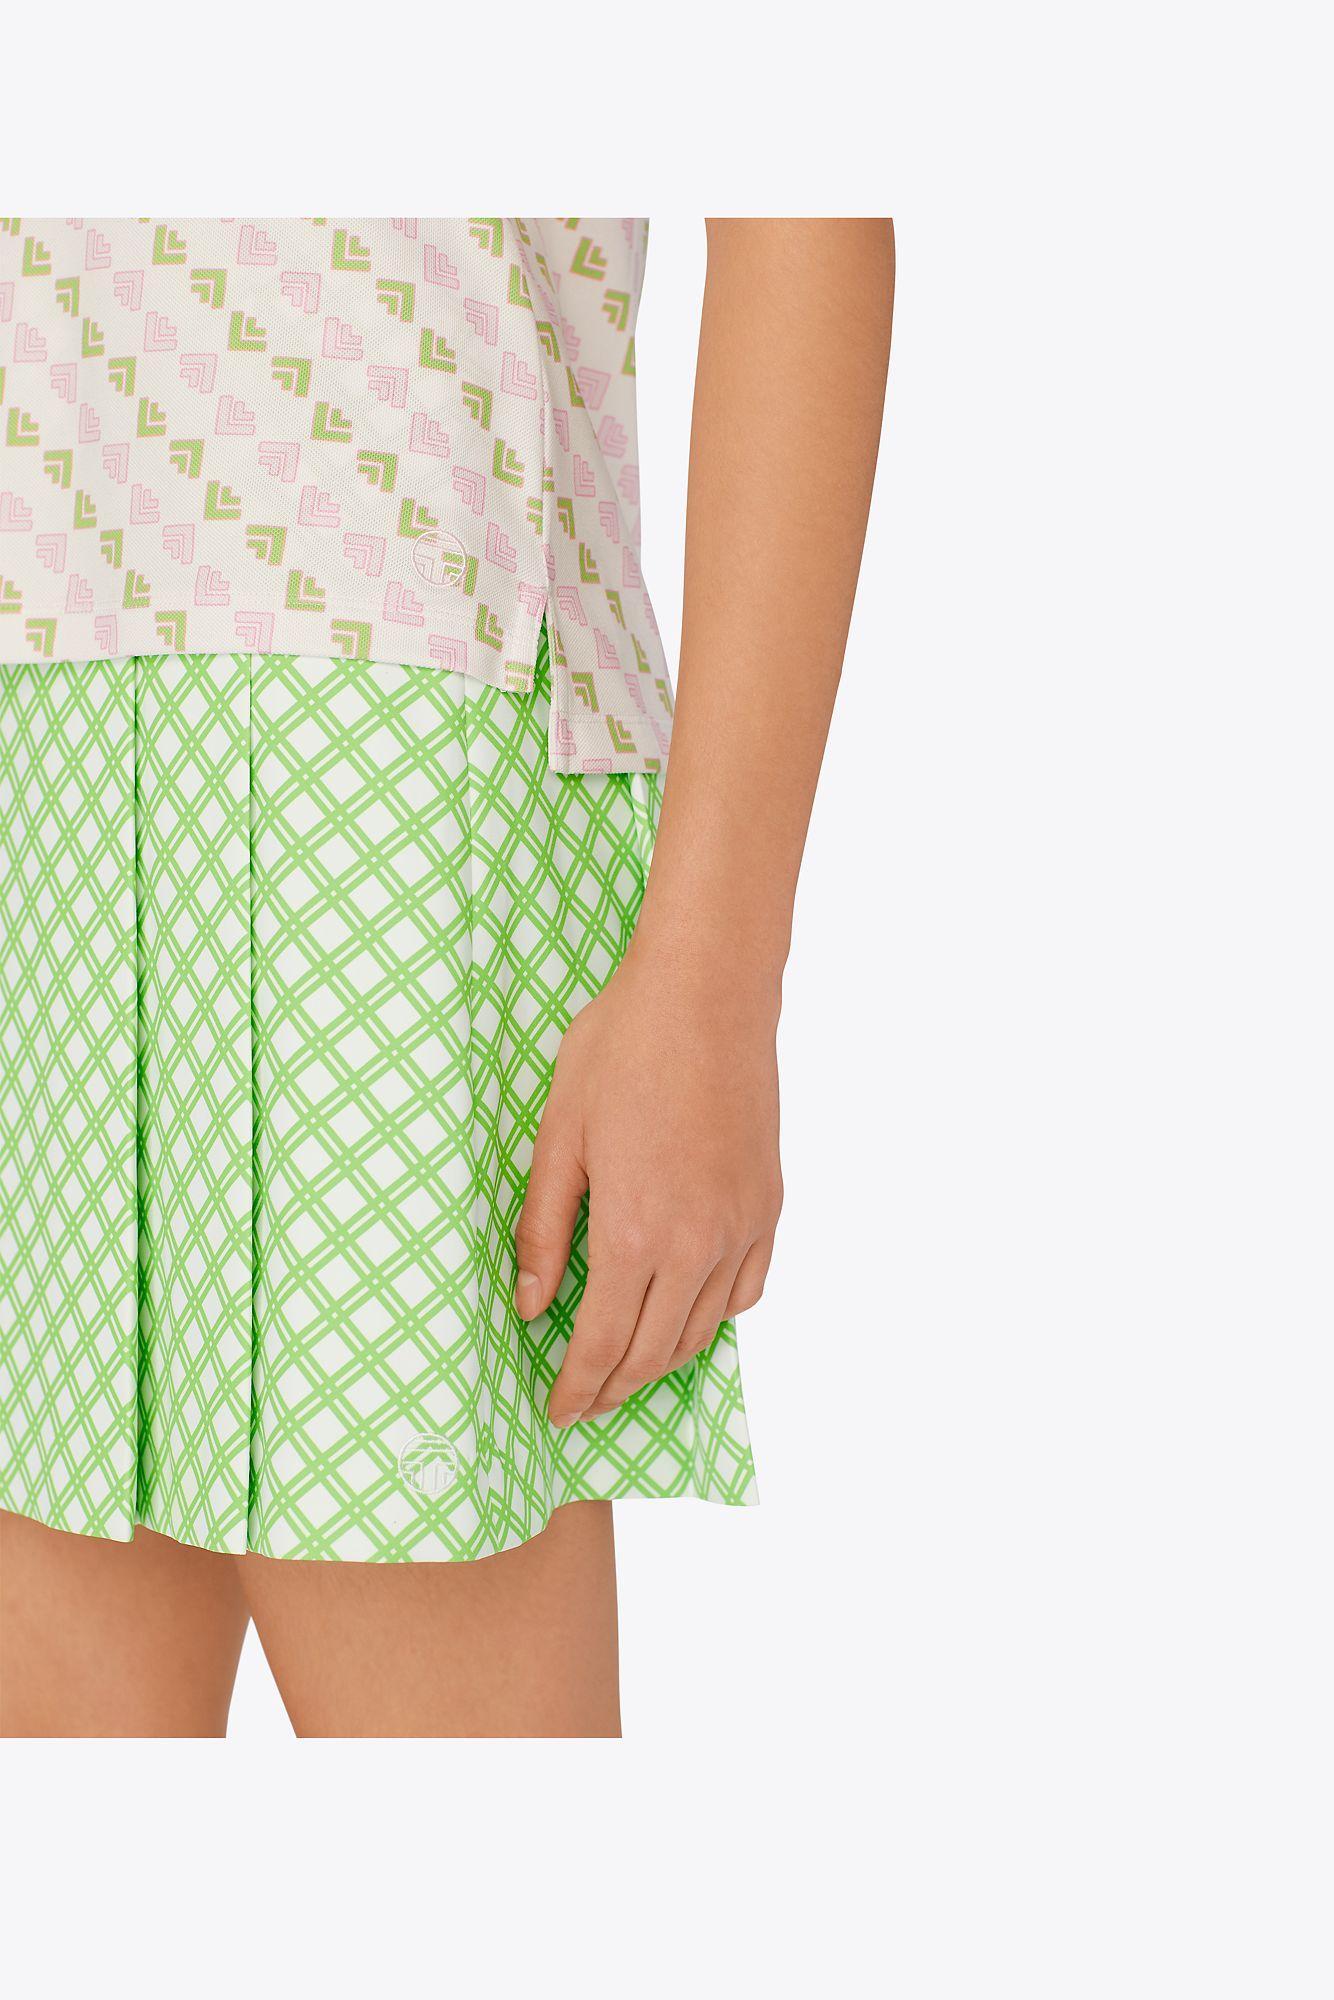 5d7fc40712 Tory Sport - Green Printed Tech Twill Pleated Golf Skirt | 377 | Sport  Performance Skirts. View fullscreen